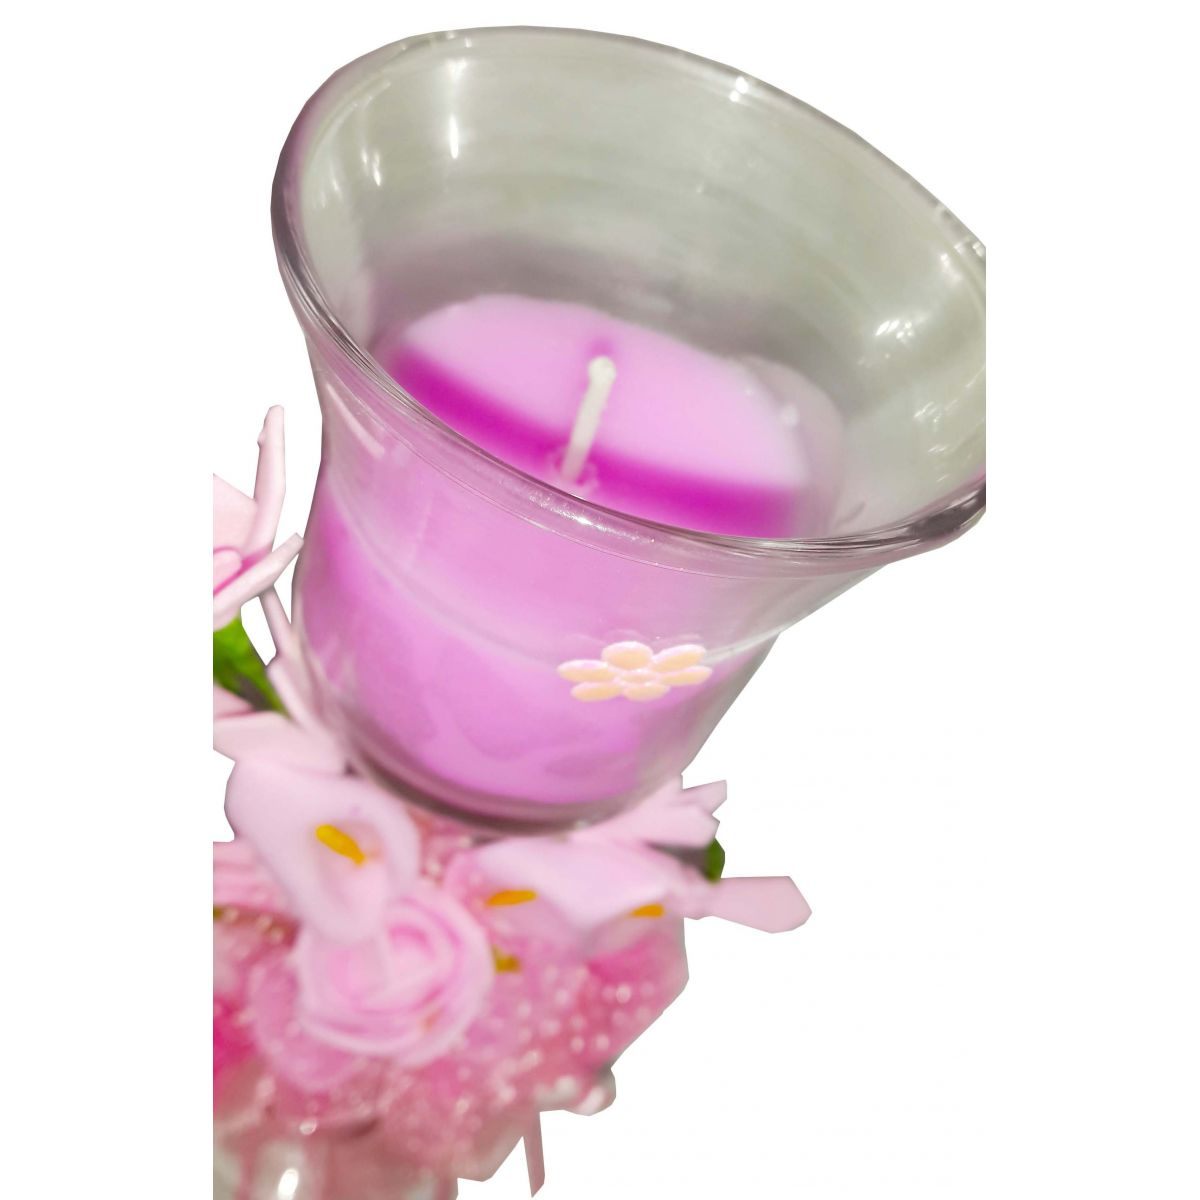 Vela Parafina Aromatizante Decorativa Media Fragrancia Flores Rosa (WL-B)